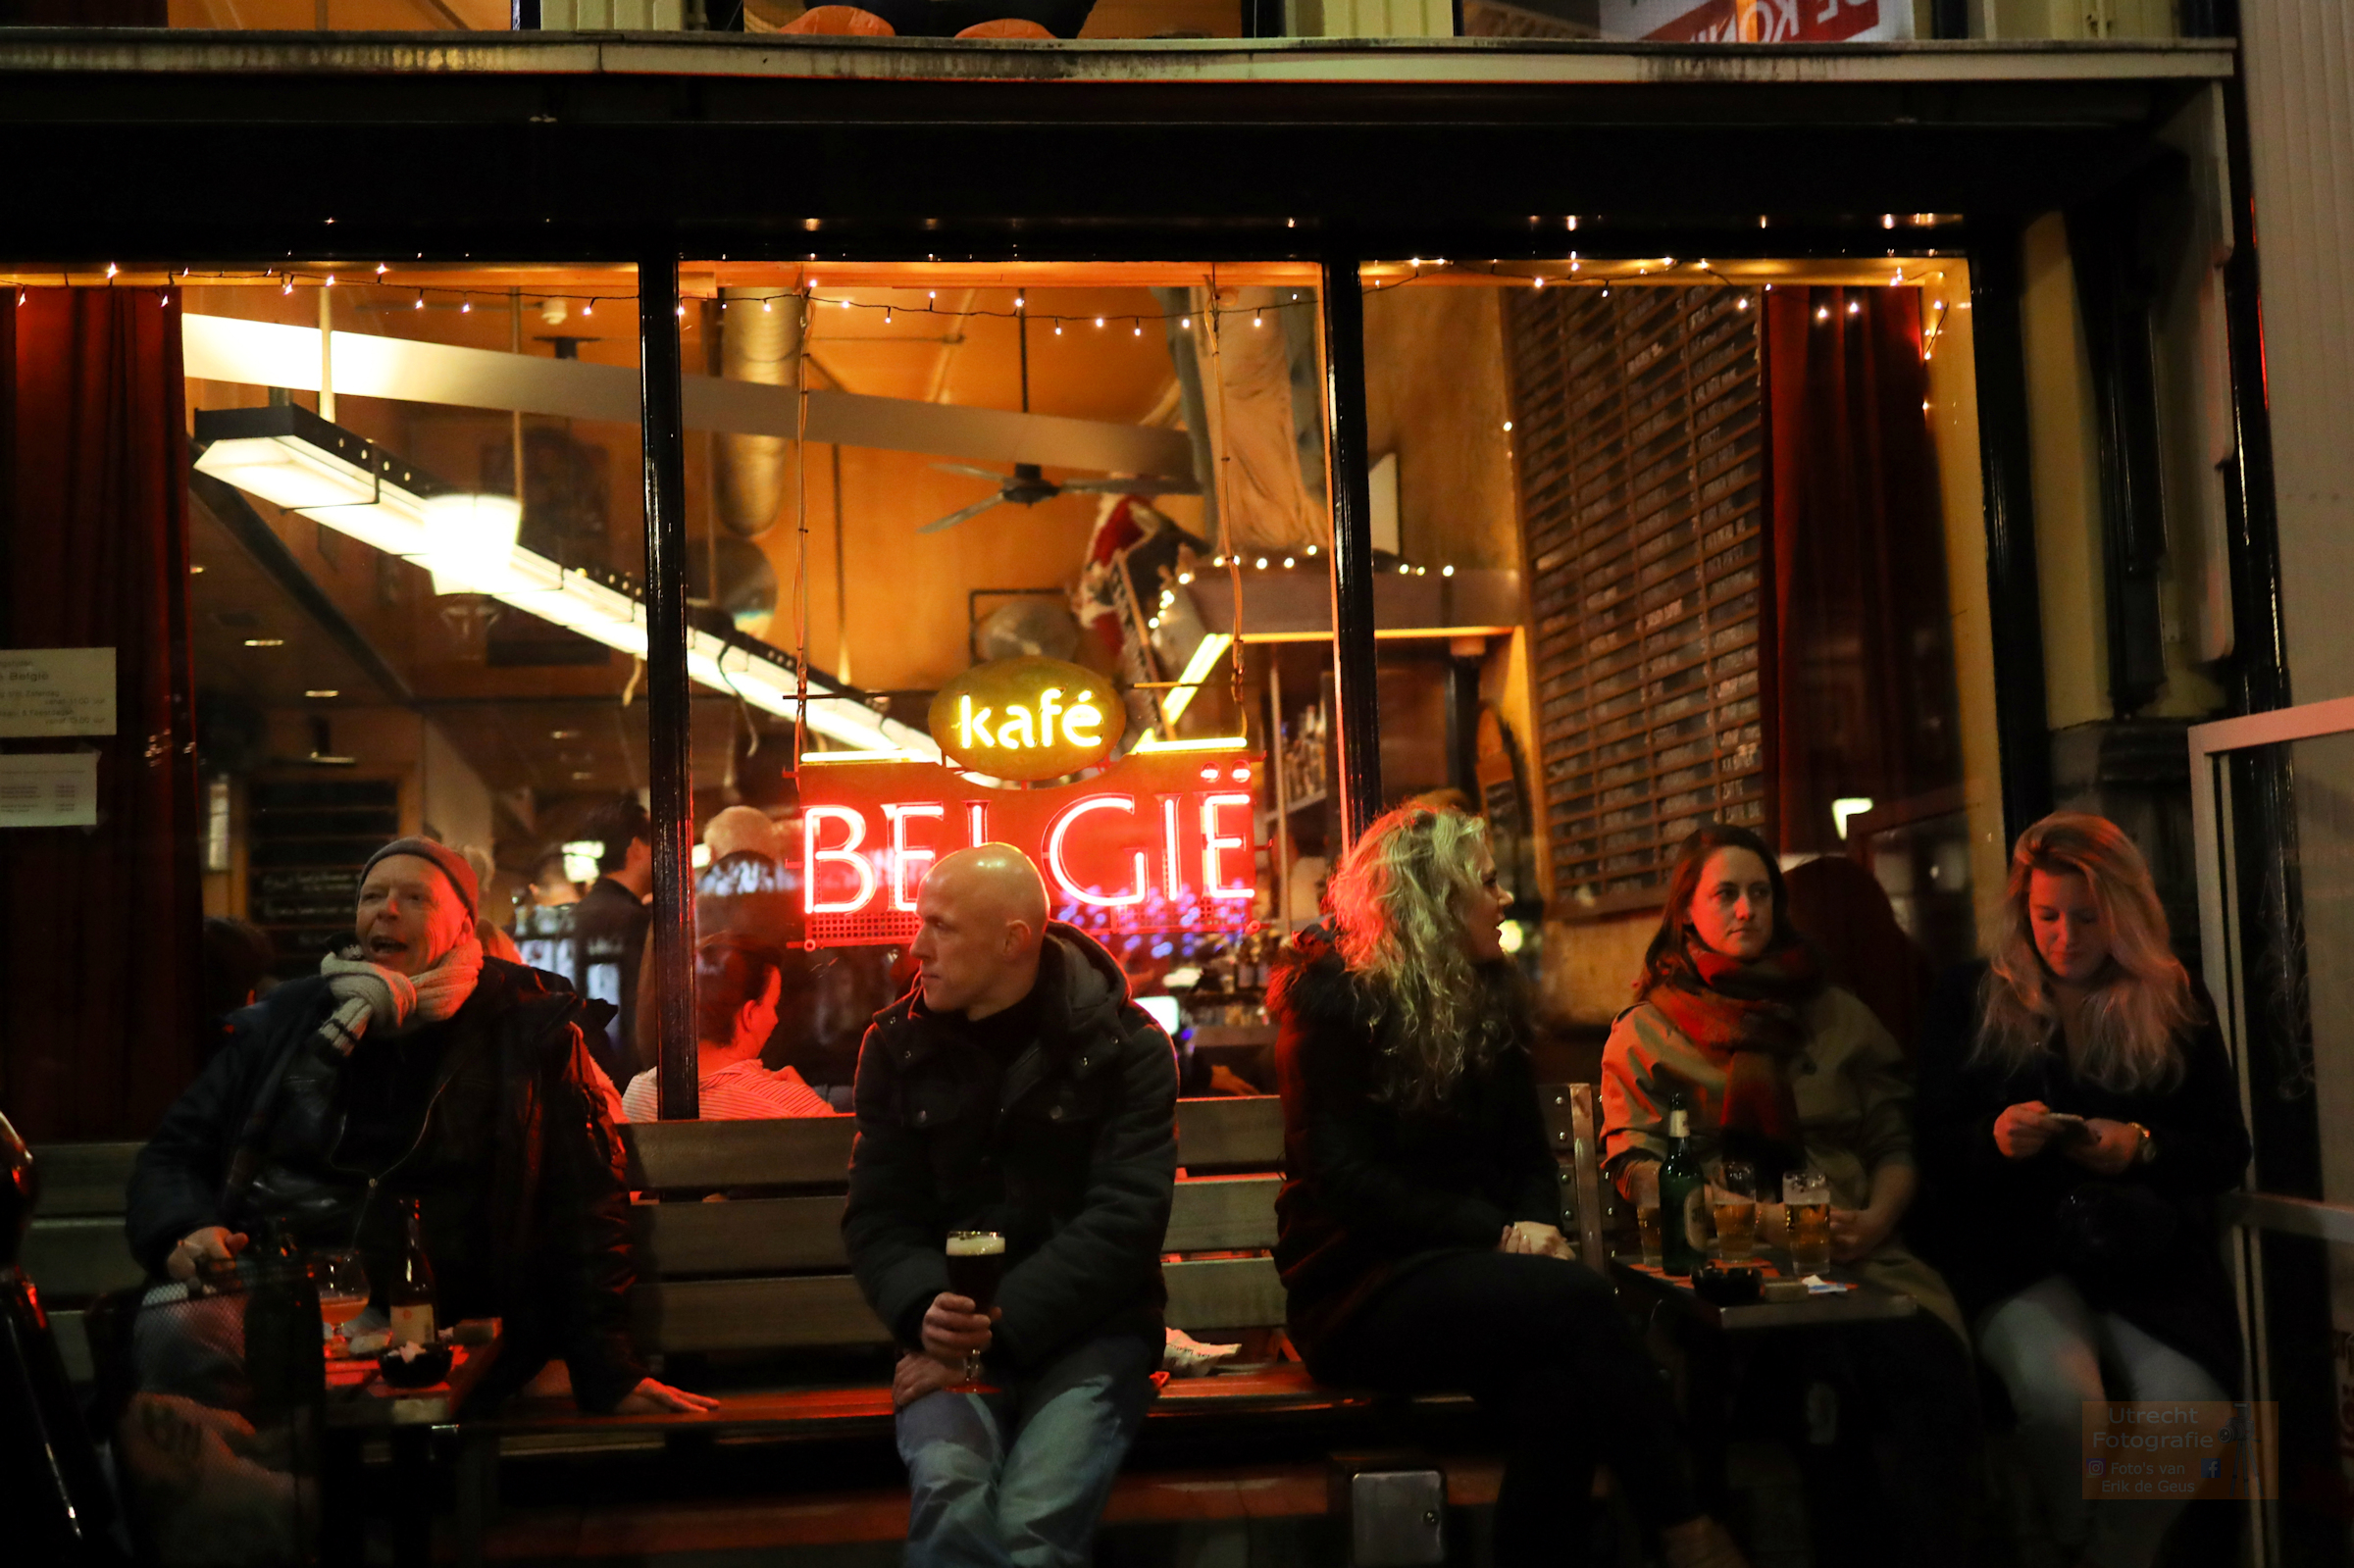 20181228 Oudegracht Kafe Belgie